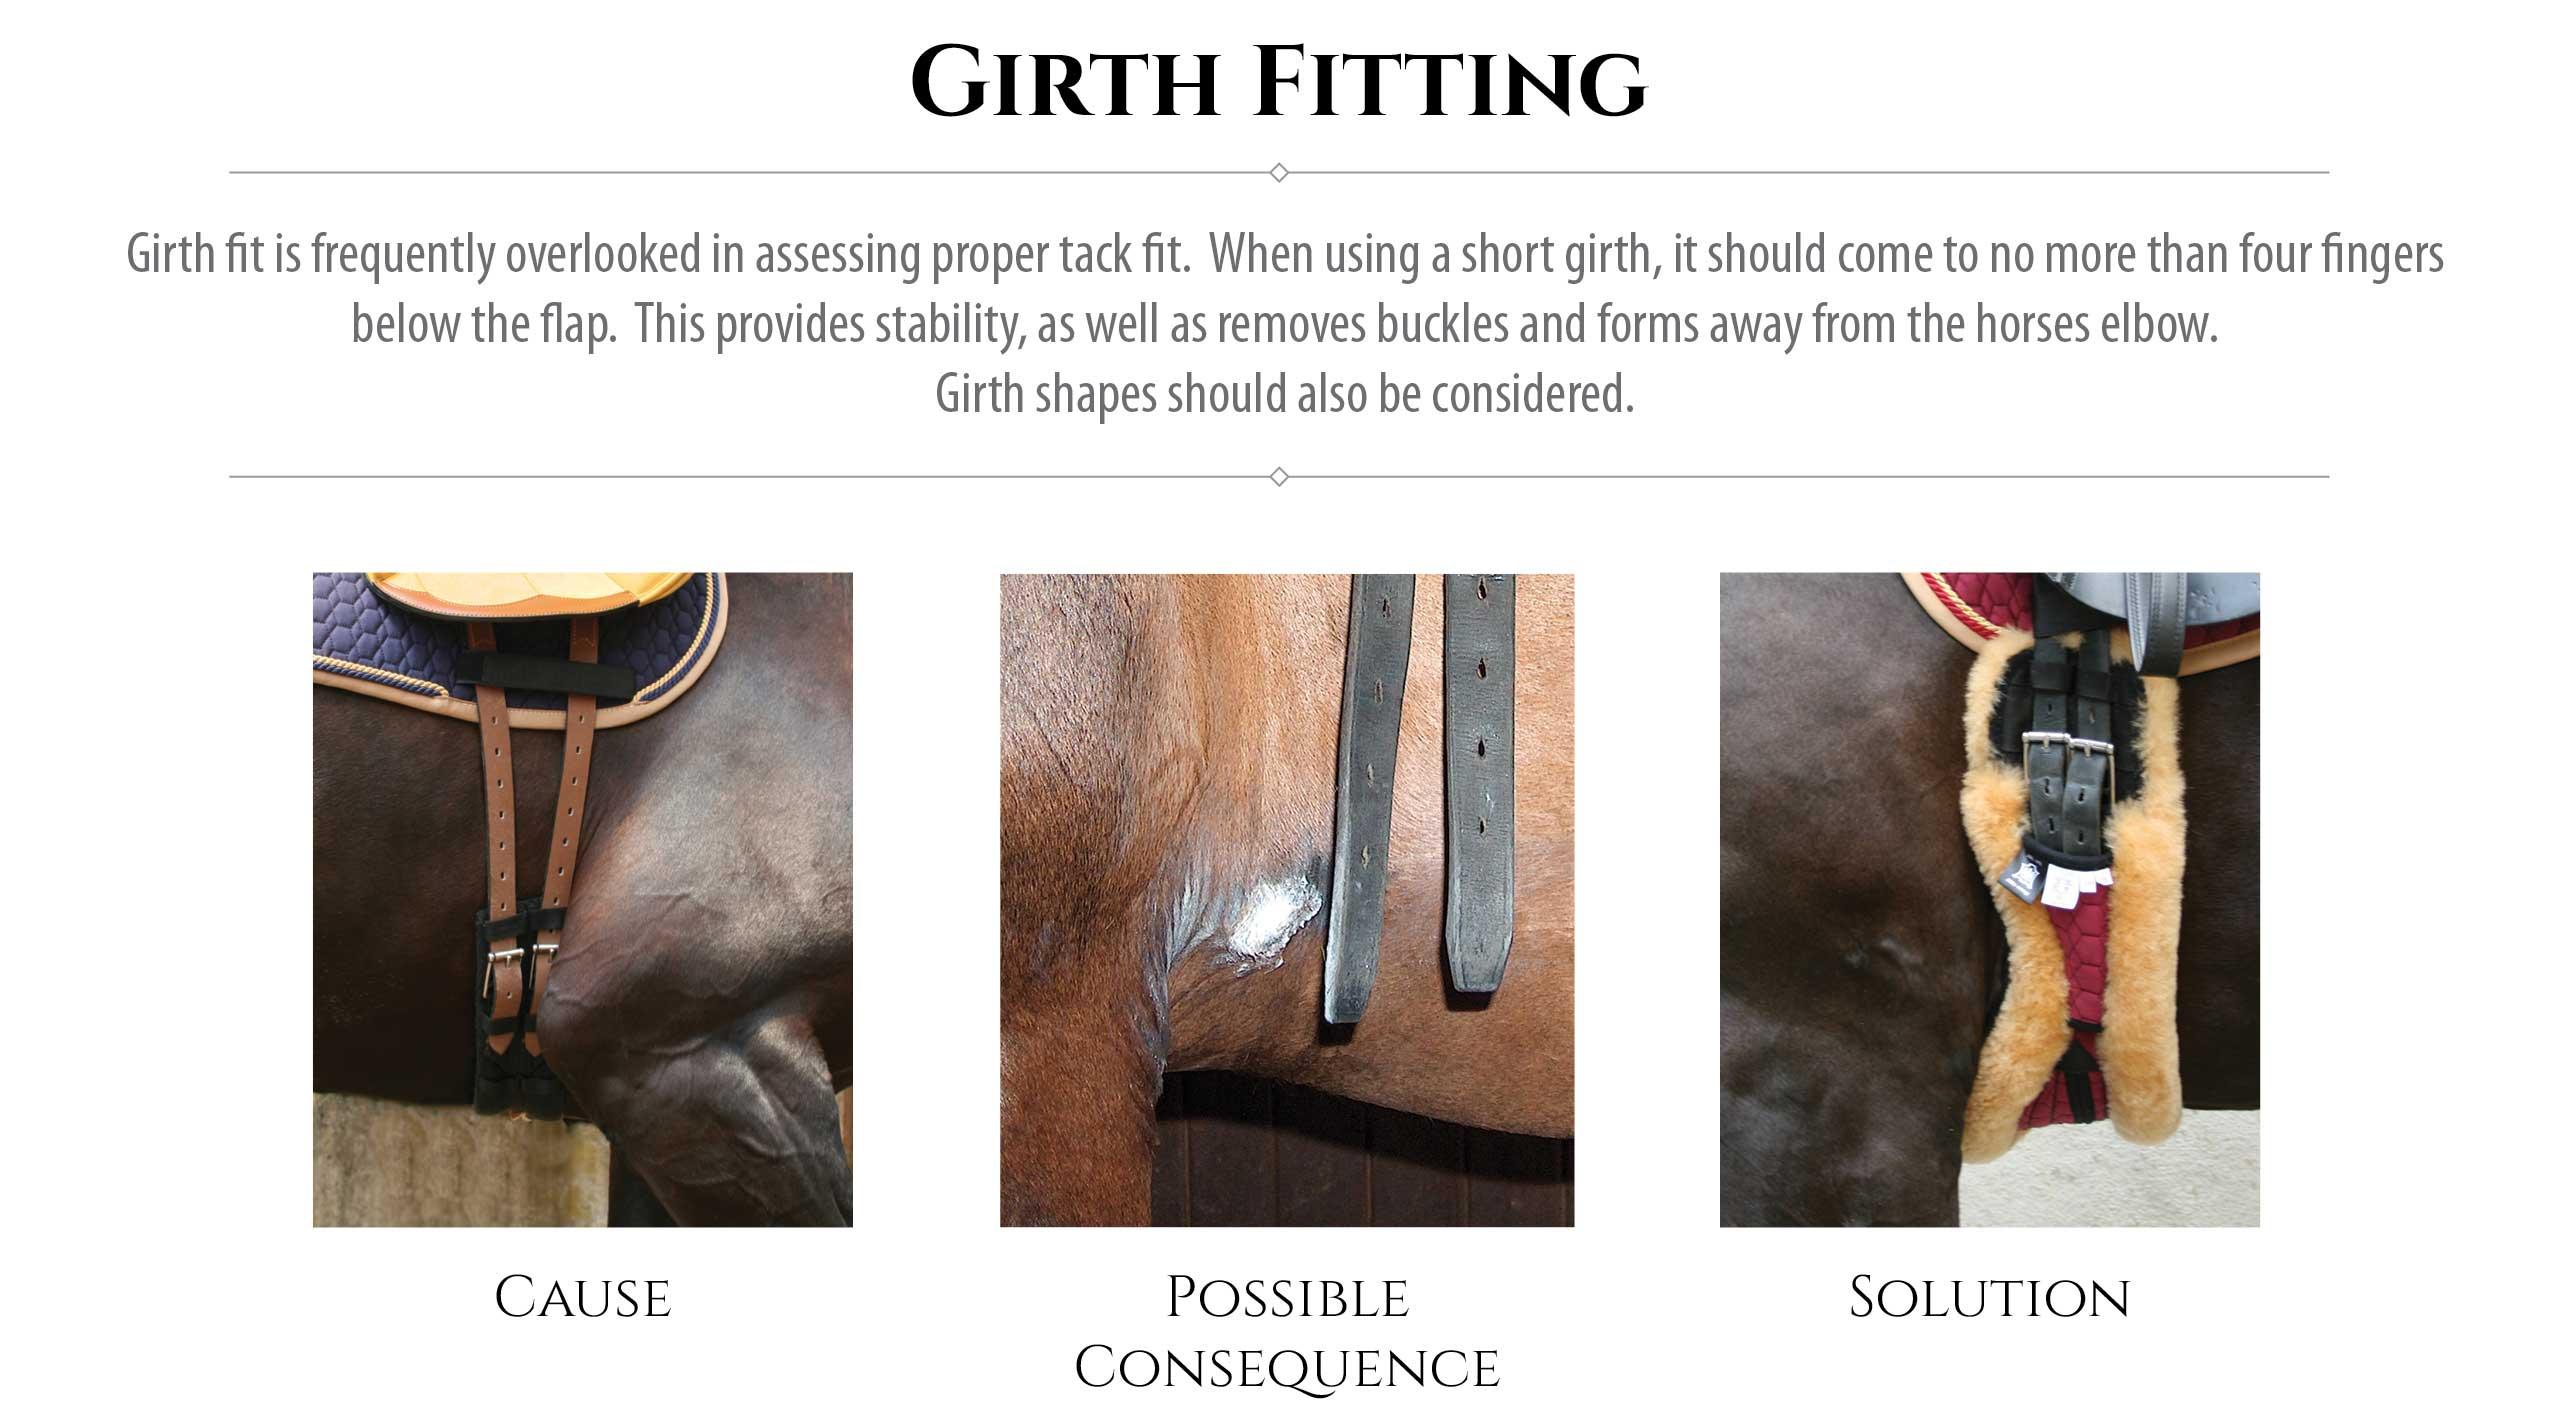 Mattes-girth-fitting